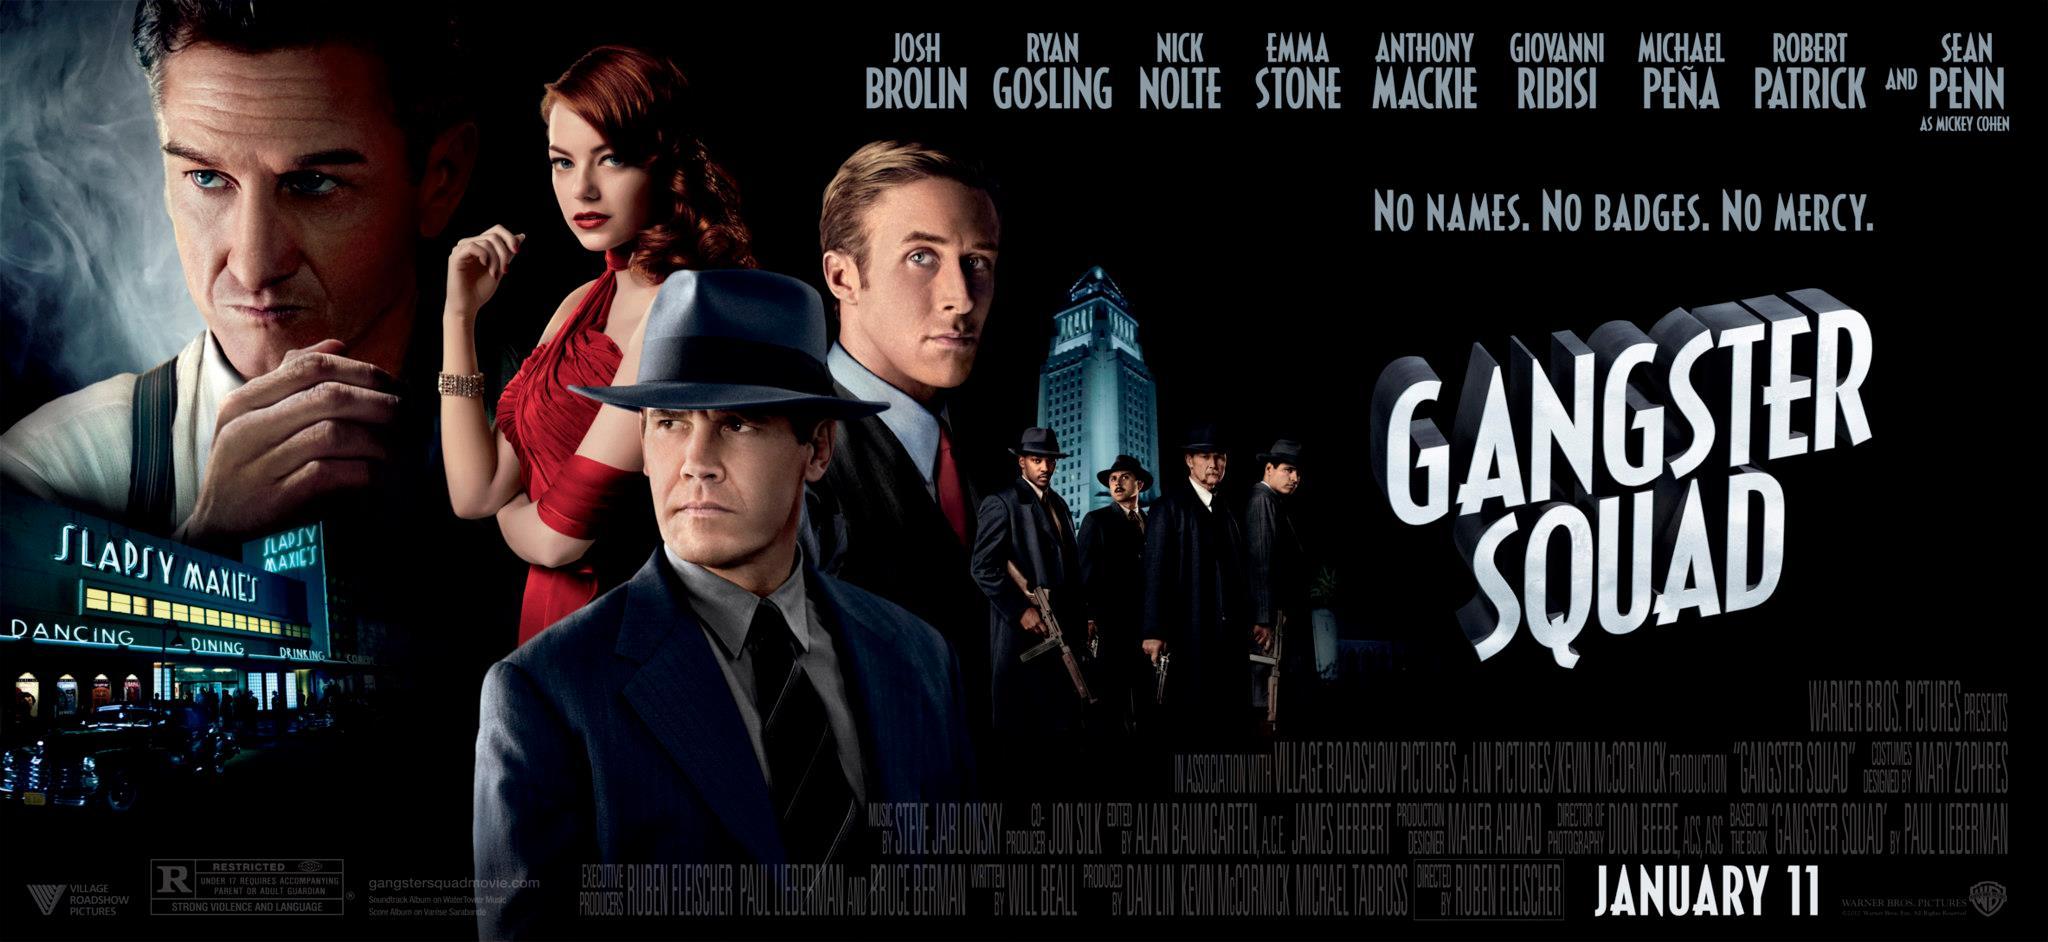 Gangster Squad (Brigada de elite) (Latino) (DvdRip) (MG)